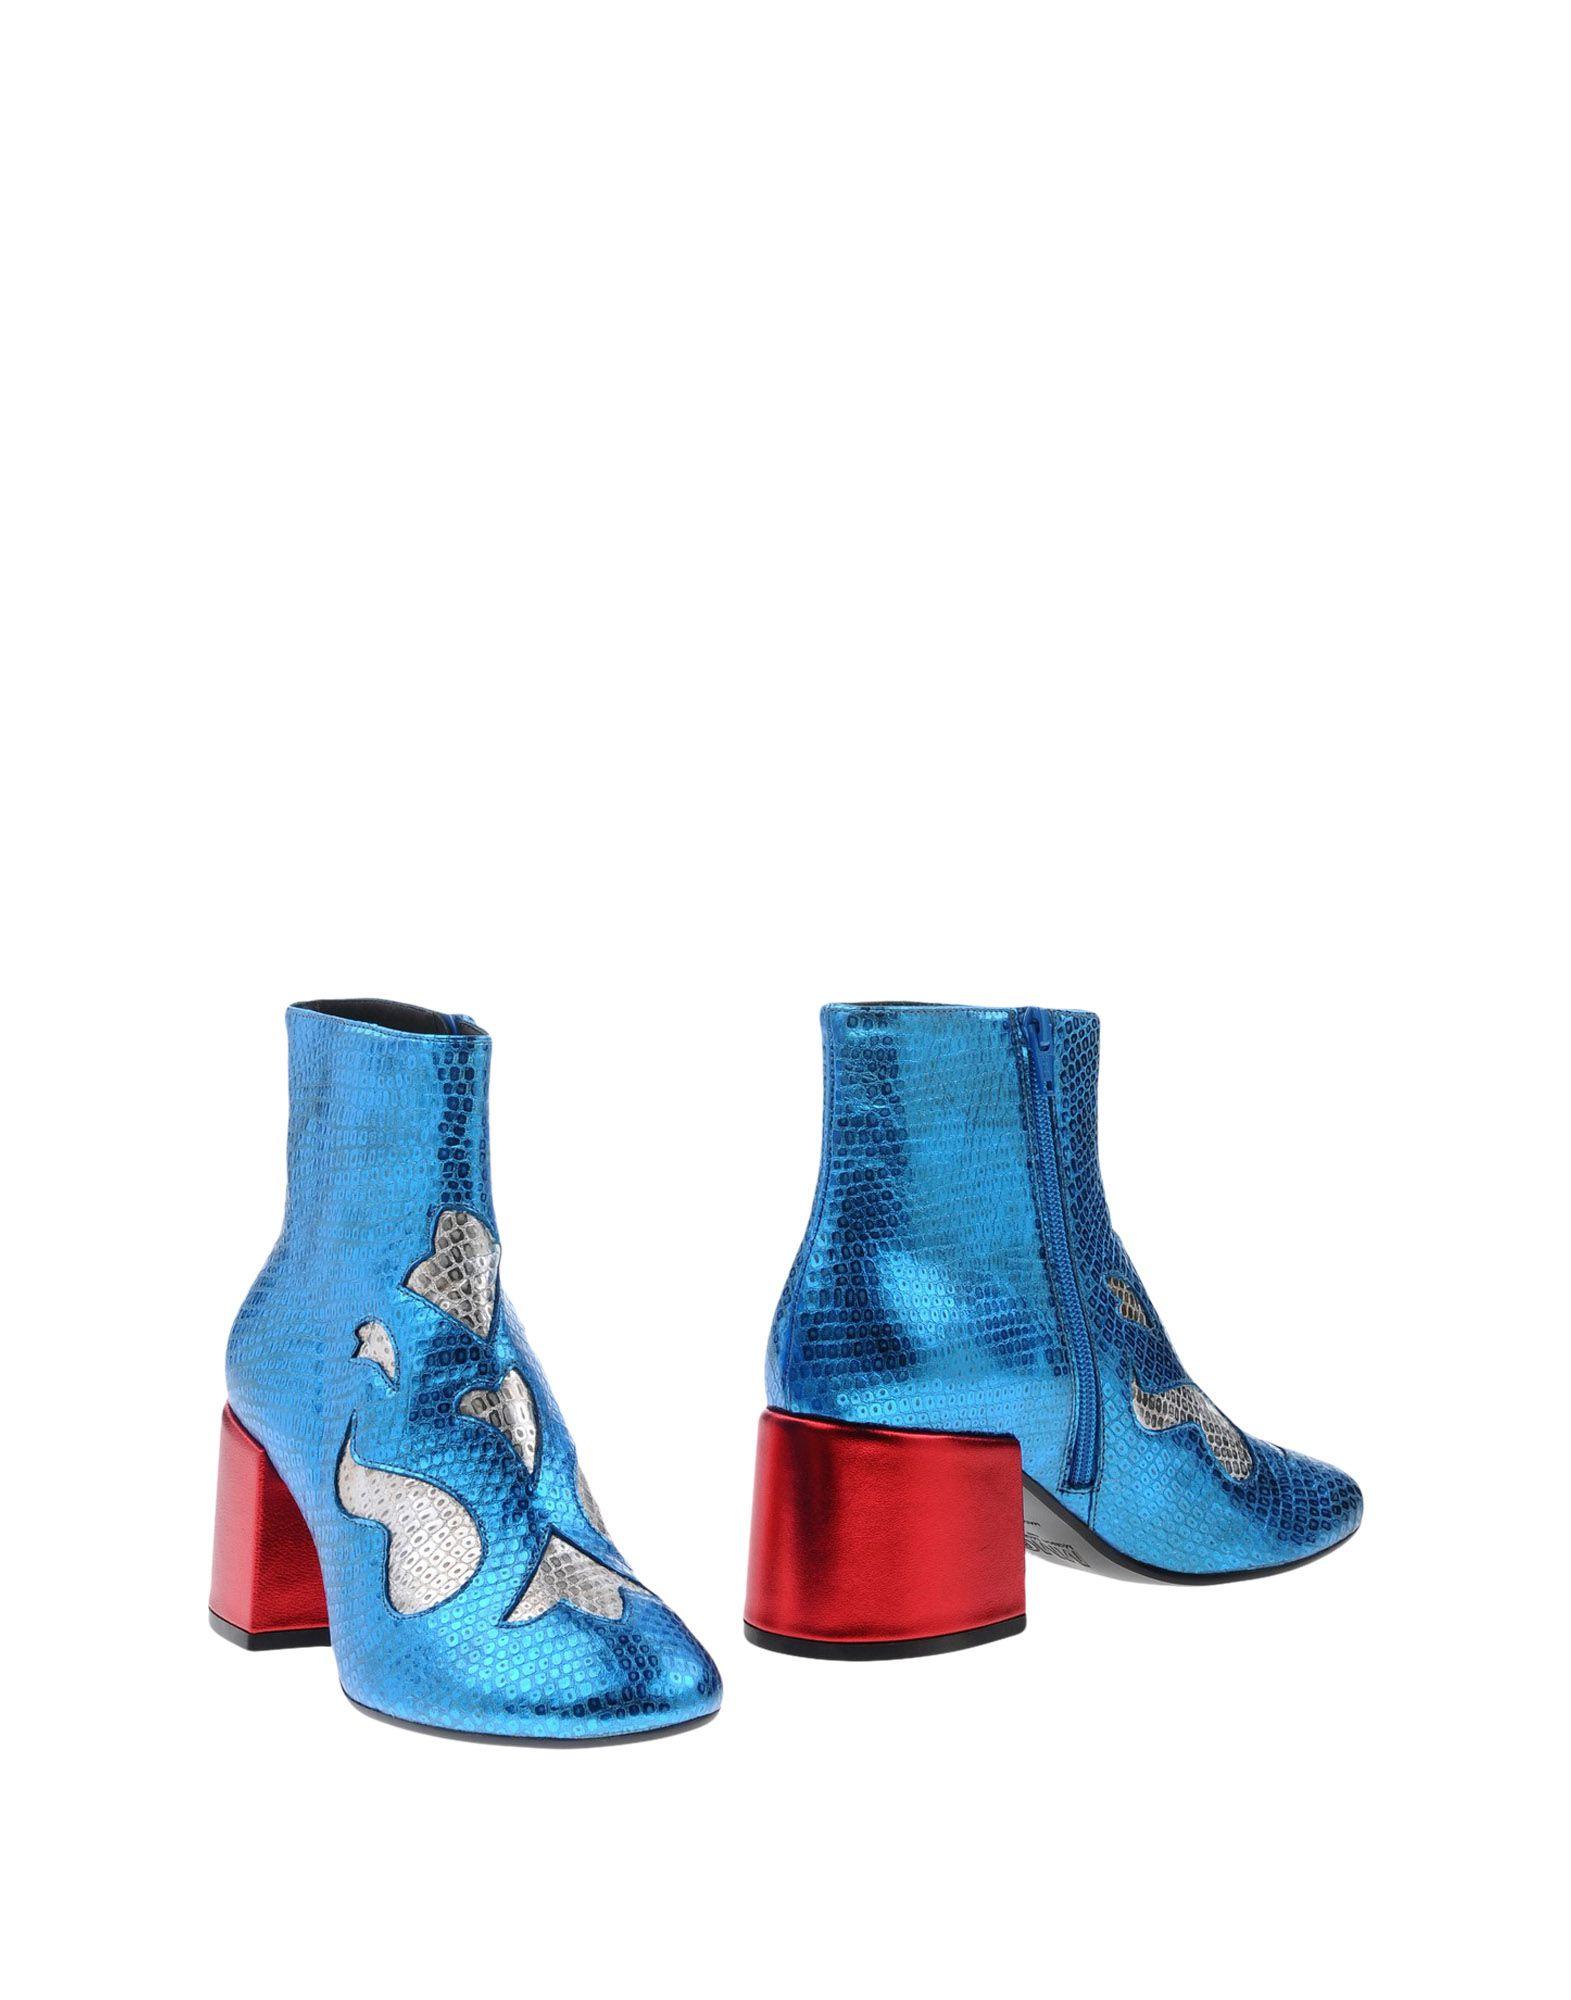 MM6 MAISON MARGIELA Полусапоги и высокие ботинки maison margiela ботинки